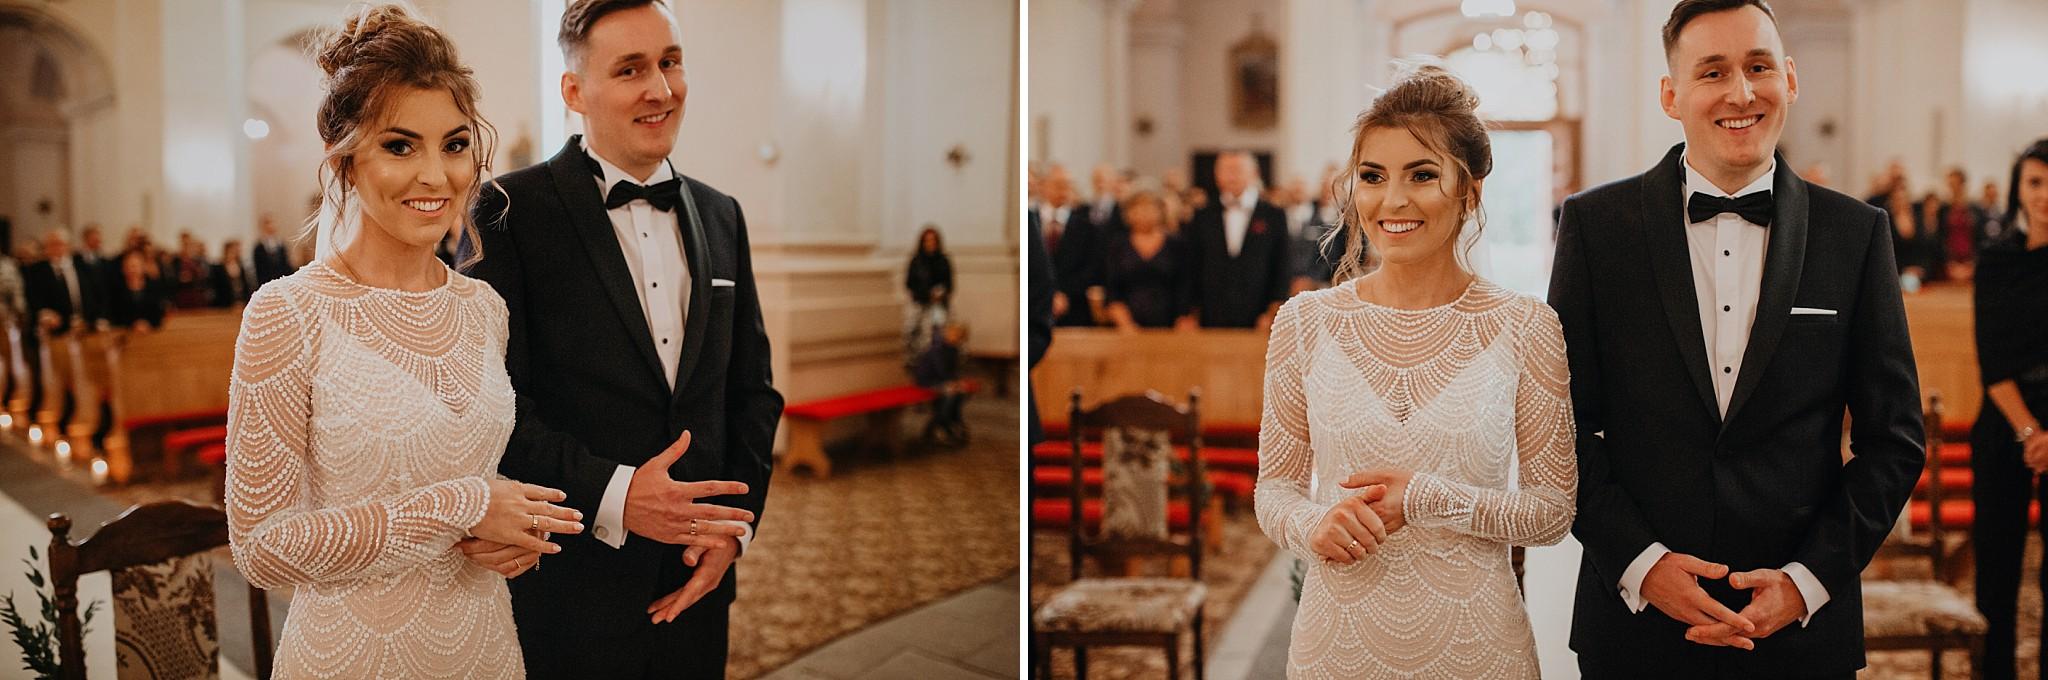 fotograf poznan wesele dobra truskawka piekne wesele pod poznaniem wesele w dobrej truskawce piekna para mloda slub marzen slub koronawirus slub listopad wesele koronawirus 185